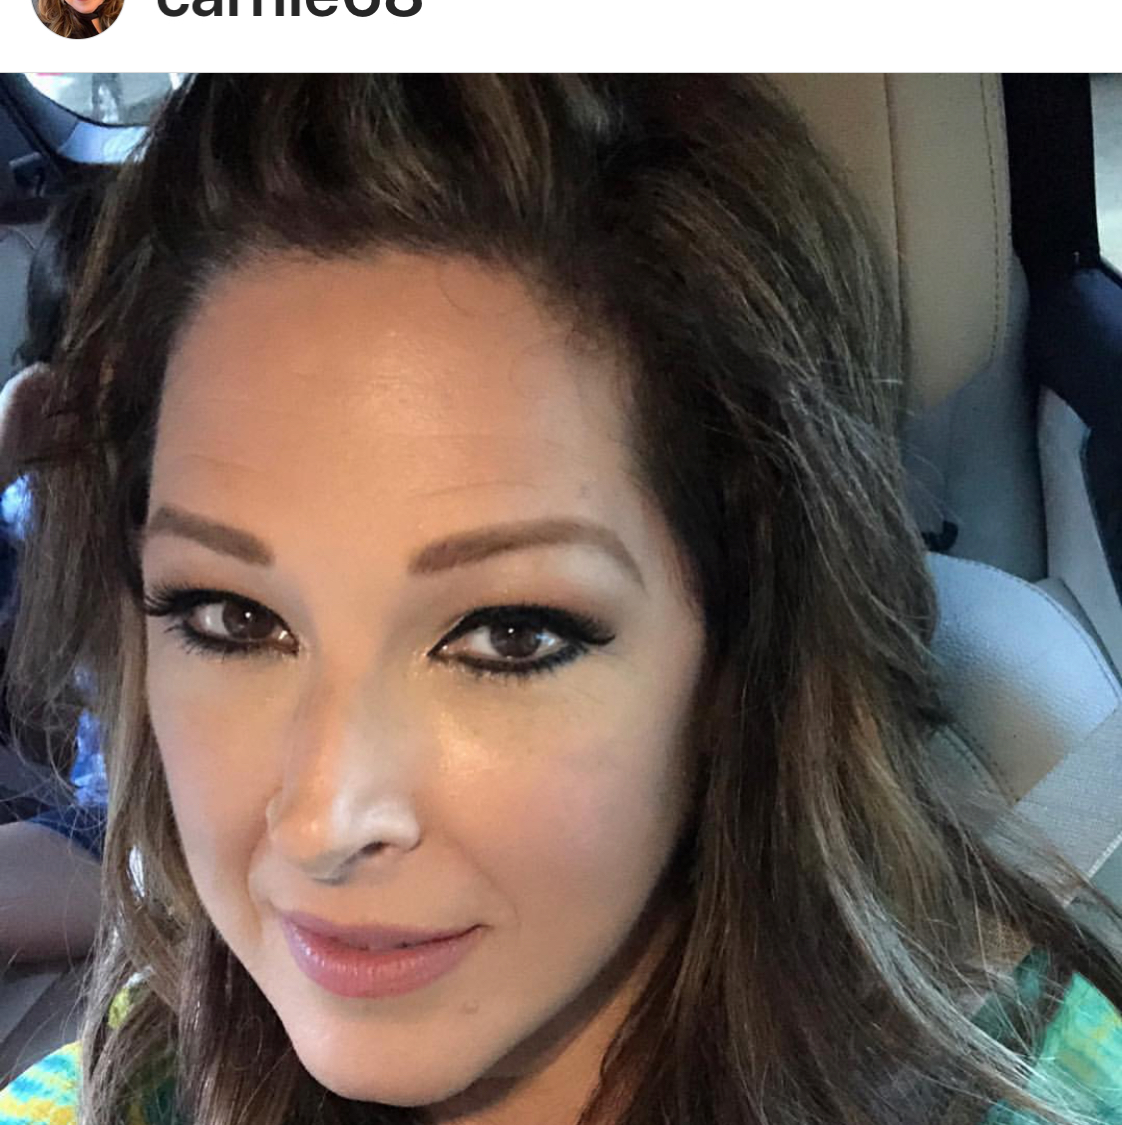 Avatar of Carnie Wilson